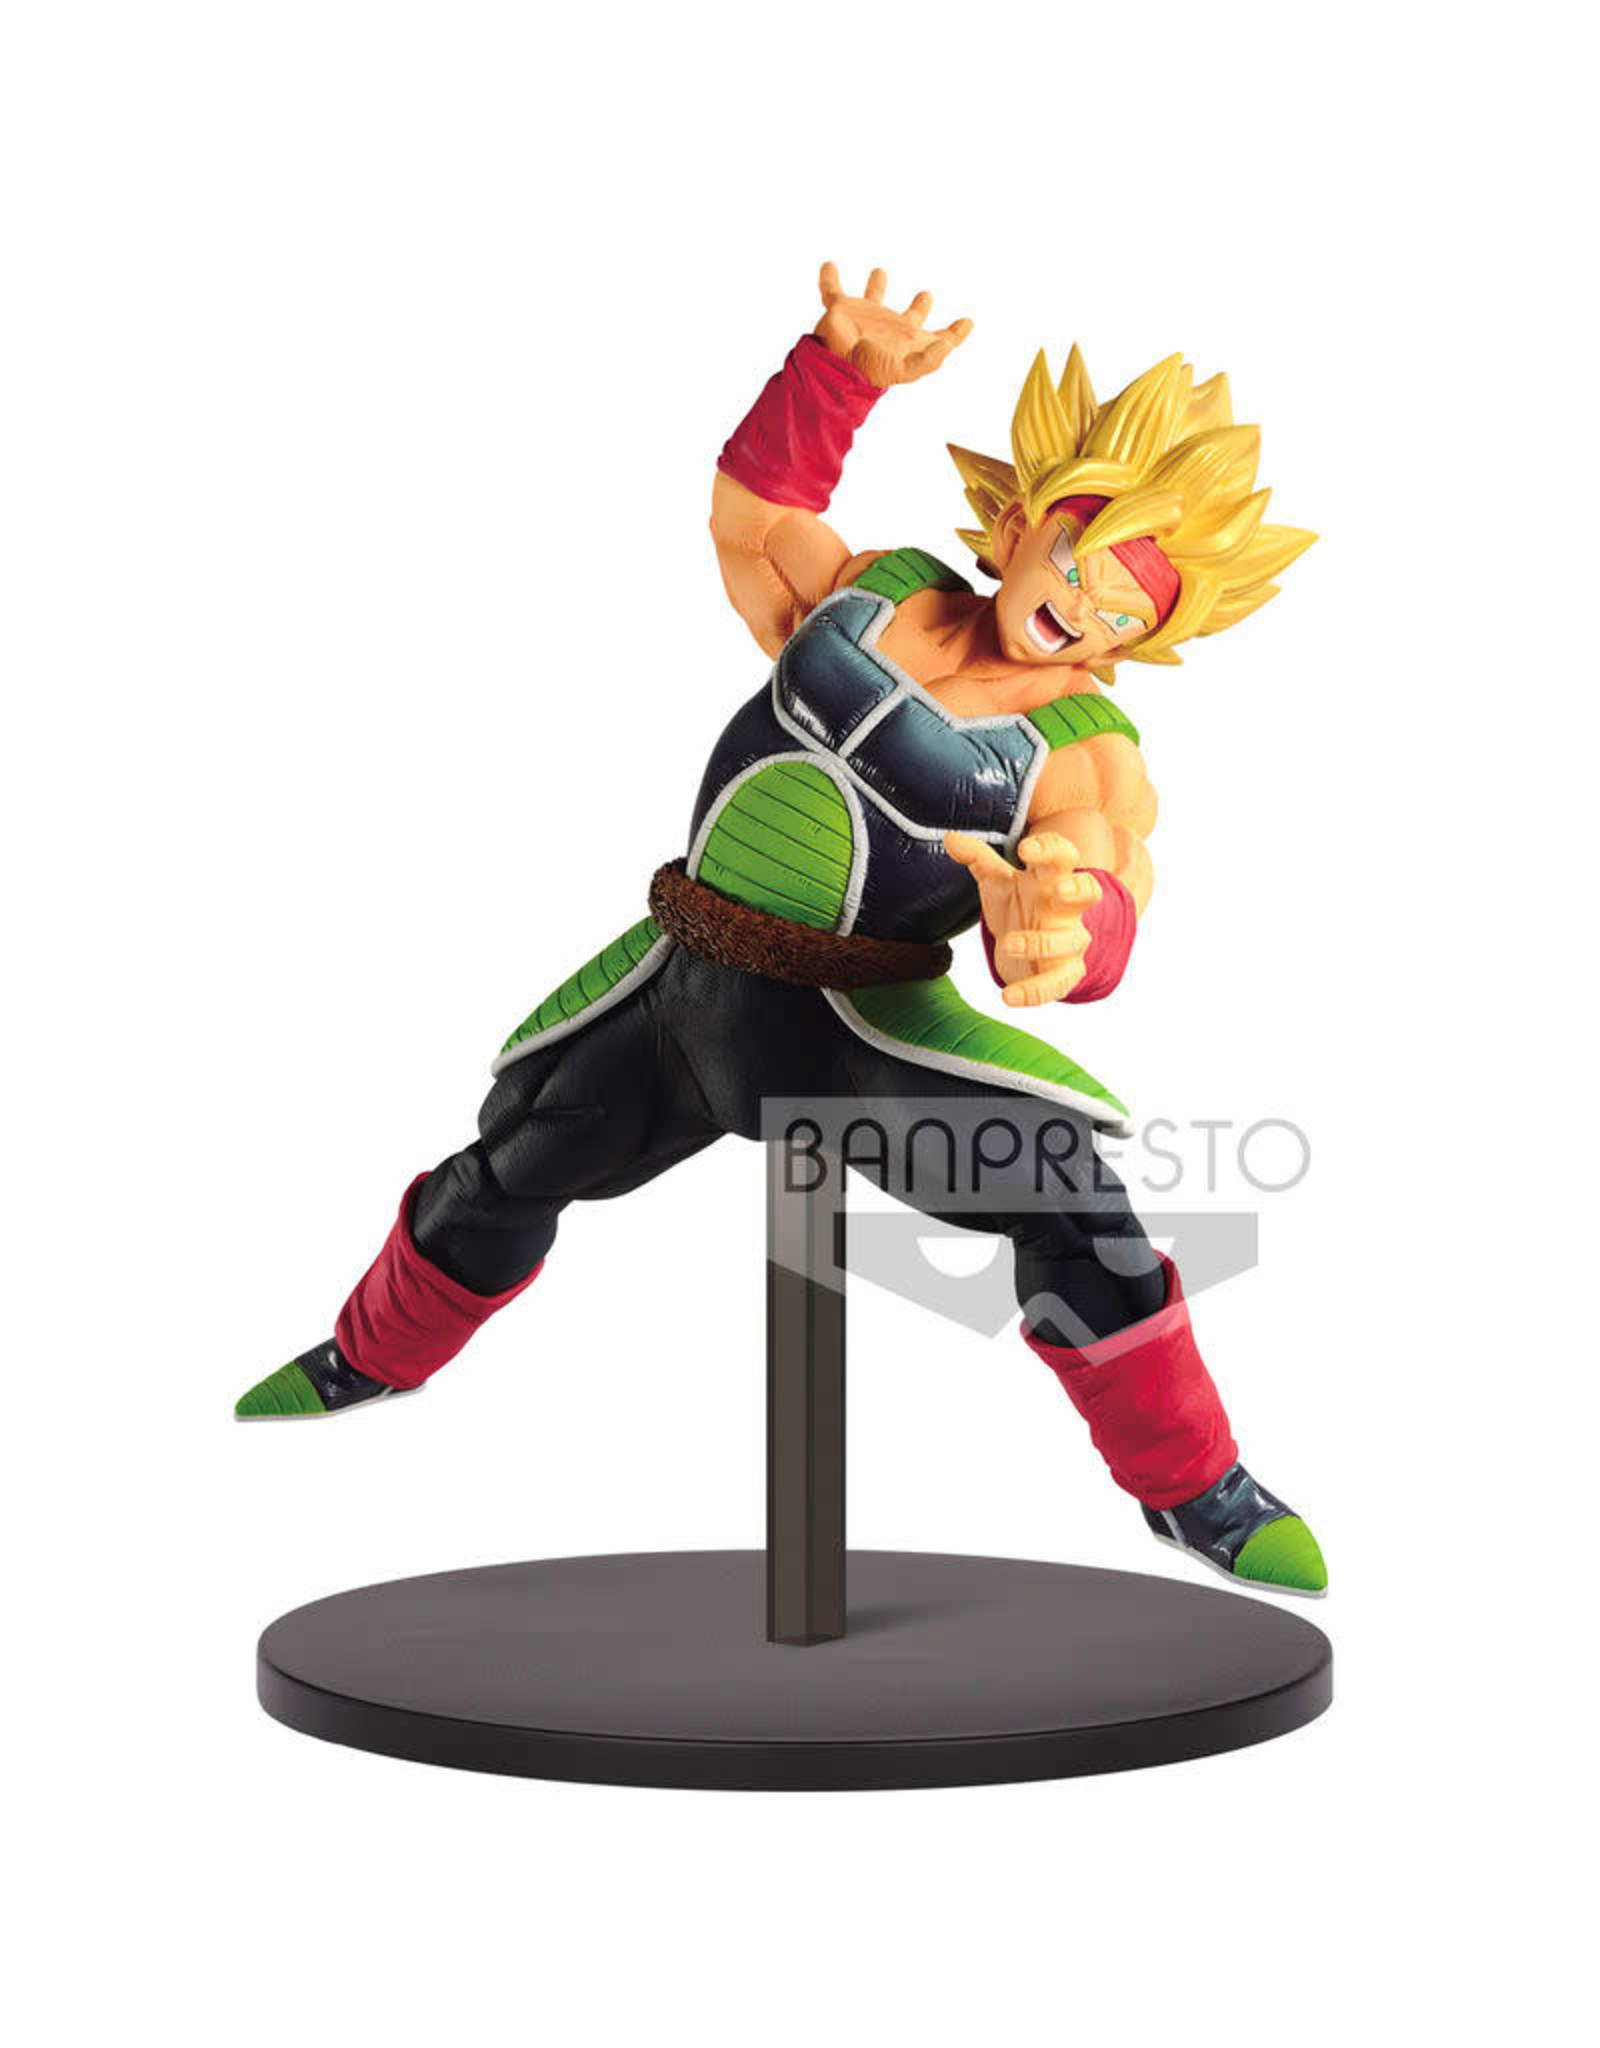 Bandai DRAGON BALL Super Figure Chosenshiretsuden 13cm - Super Saiyan Bardock